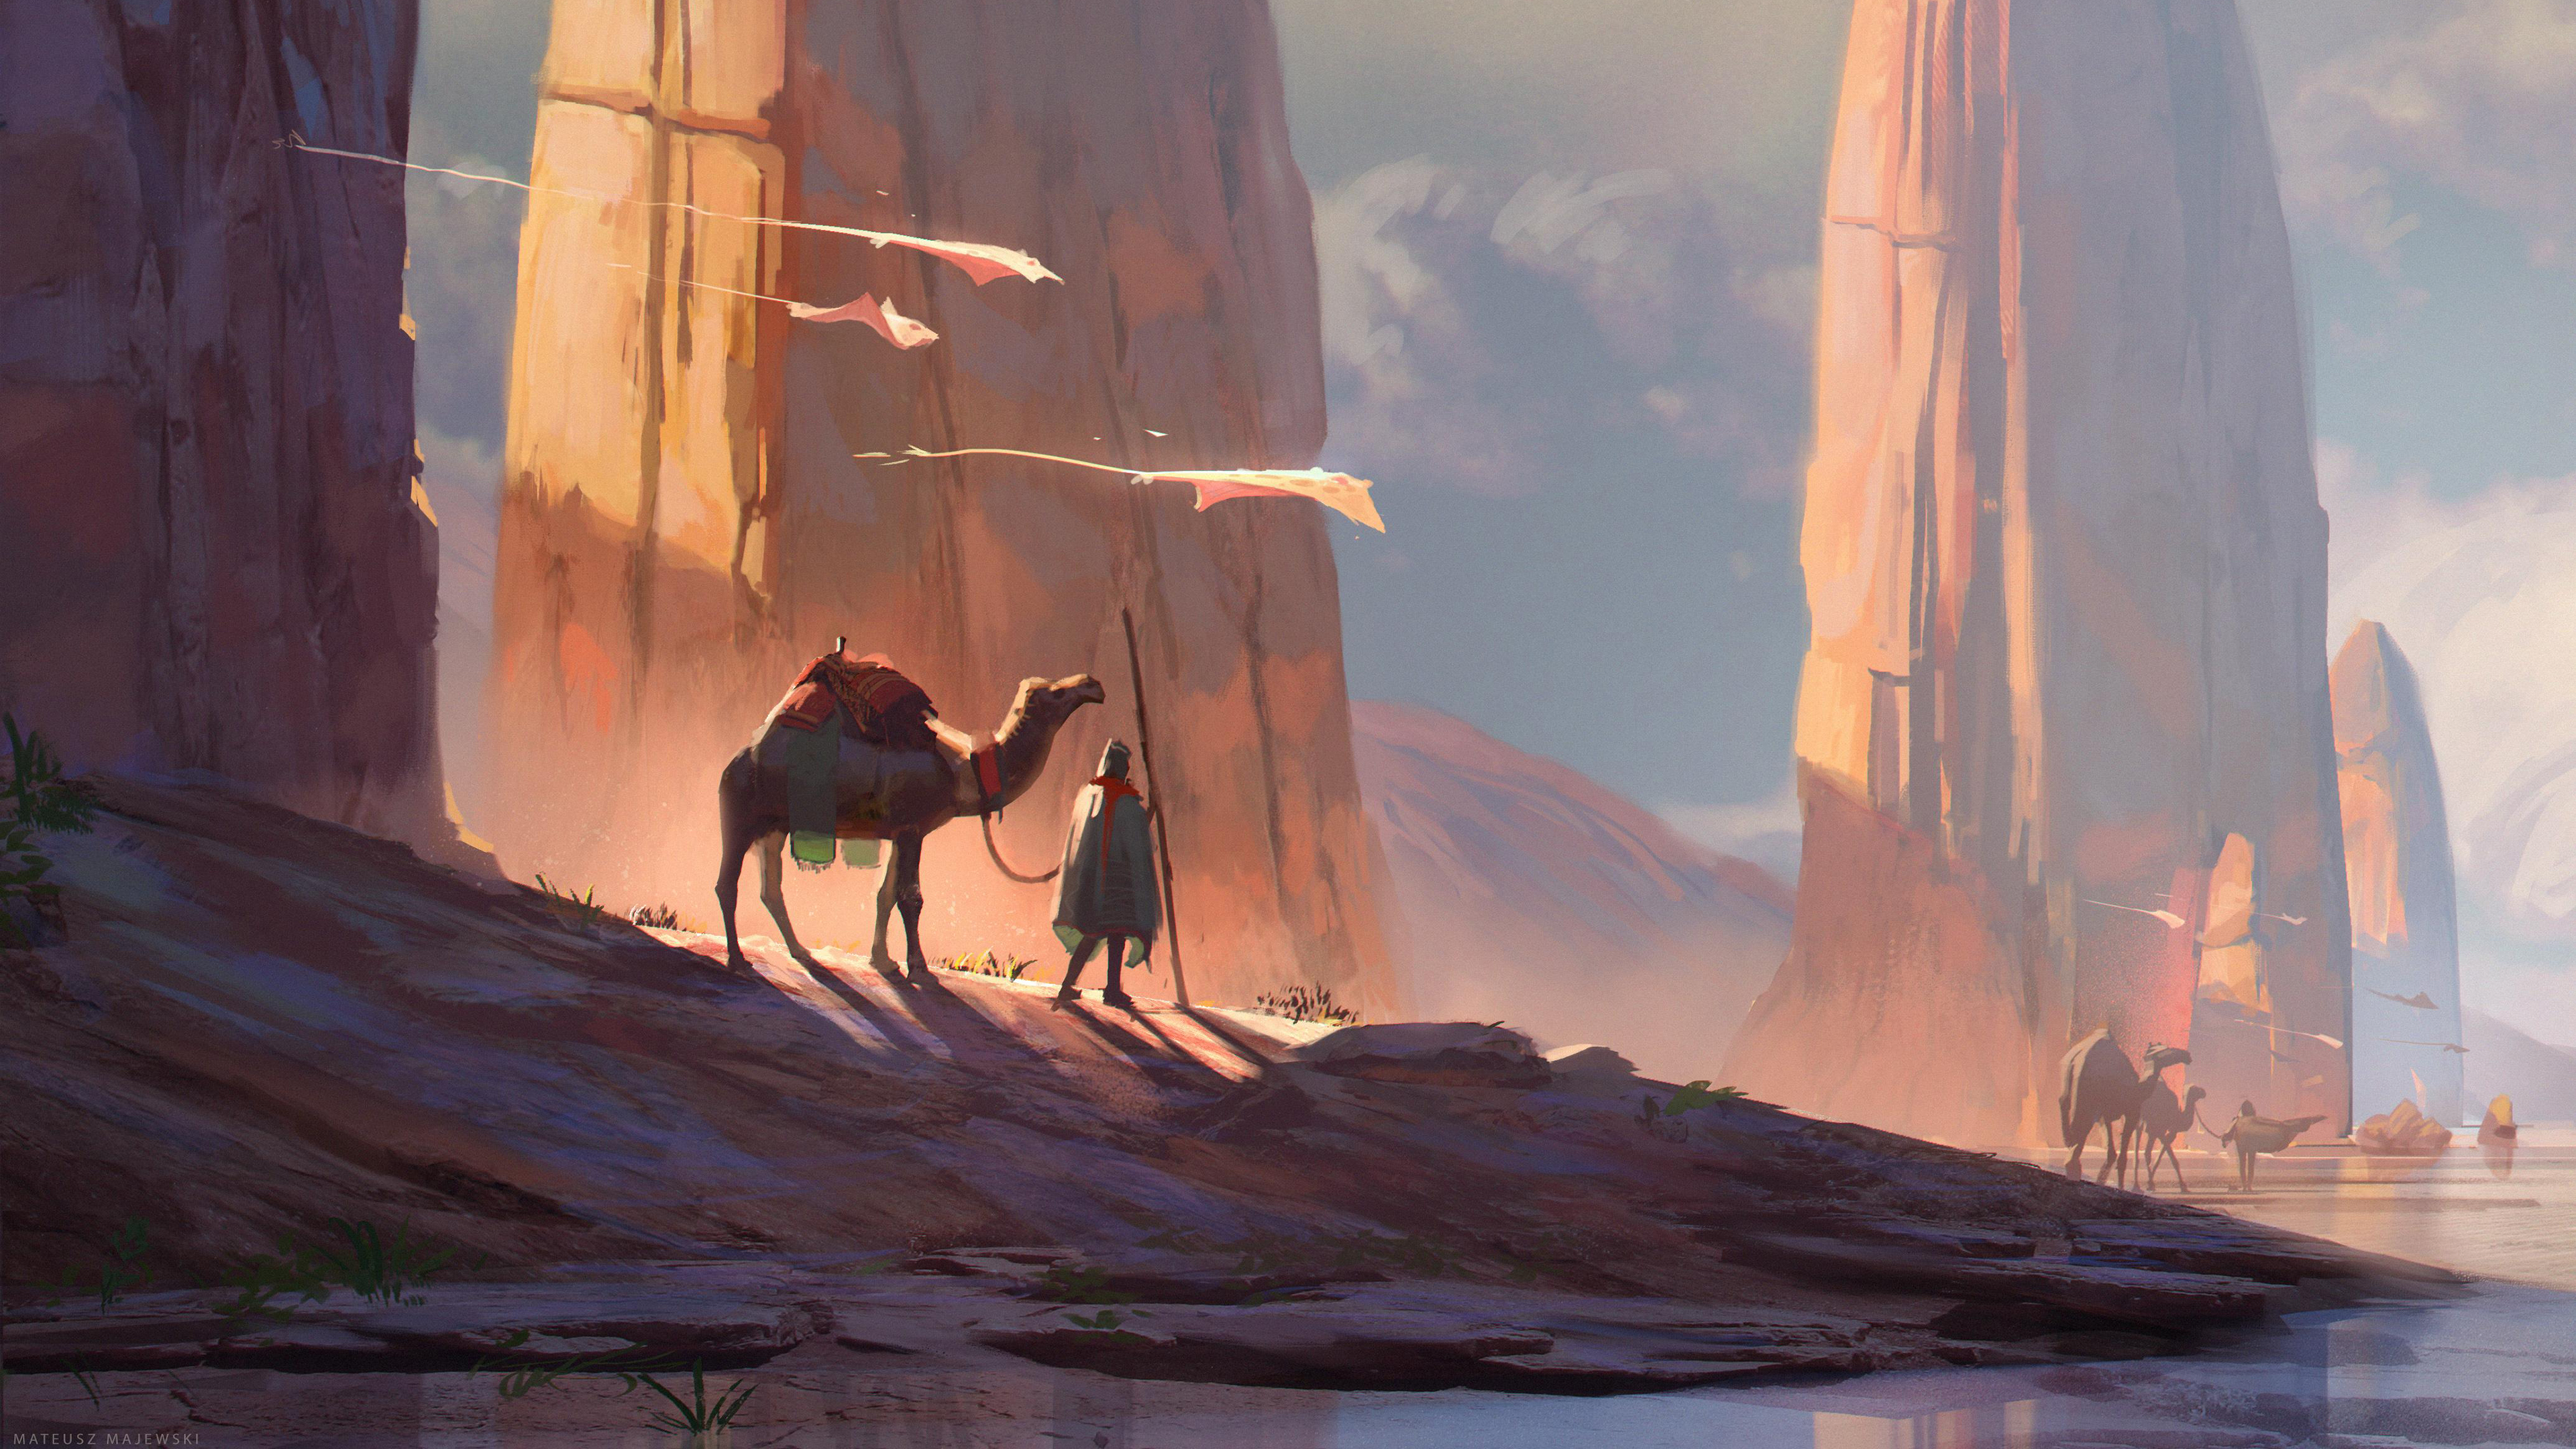 Digital Art Camel Desert 4k Hd Artist 4k Wallpapers